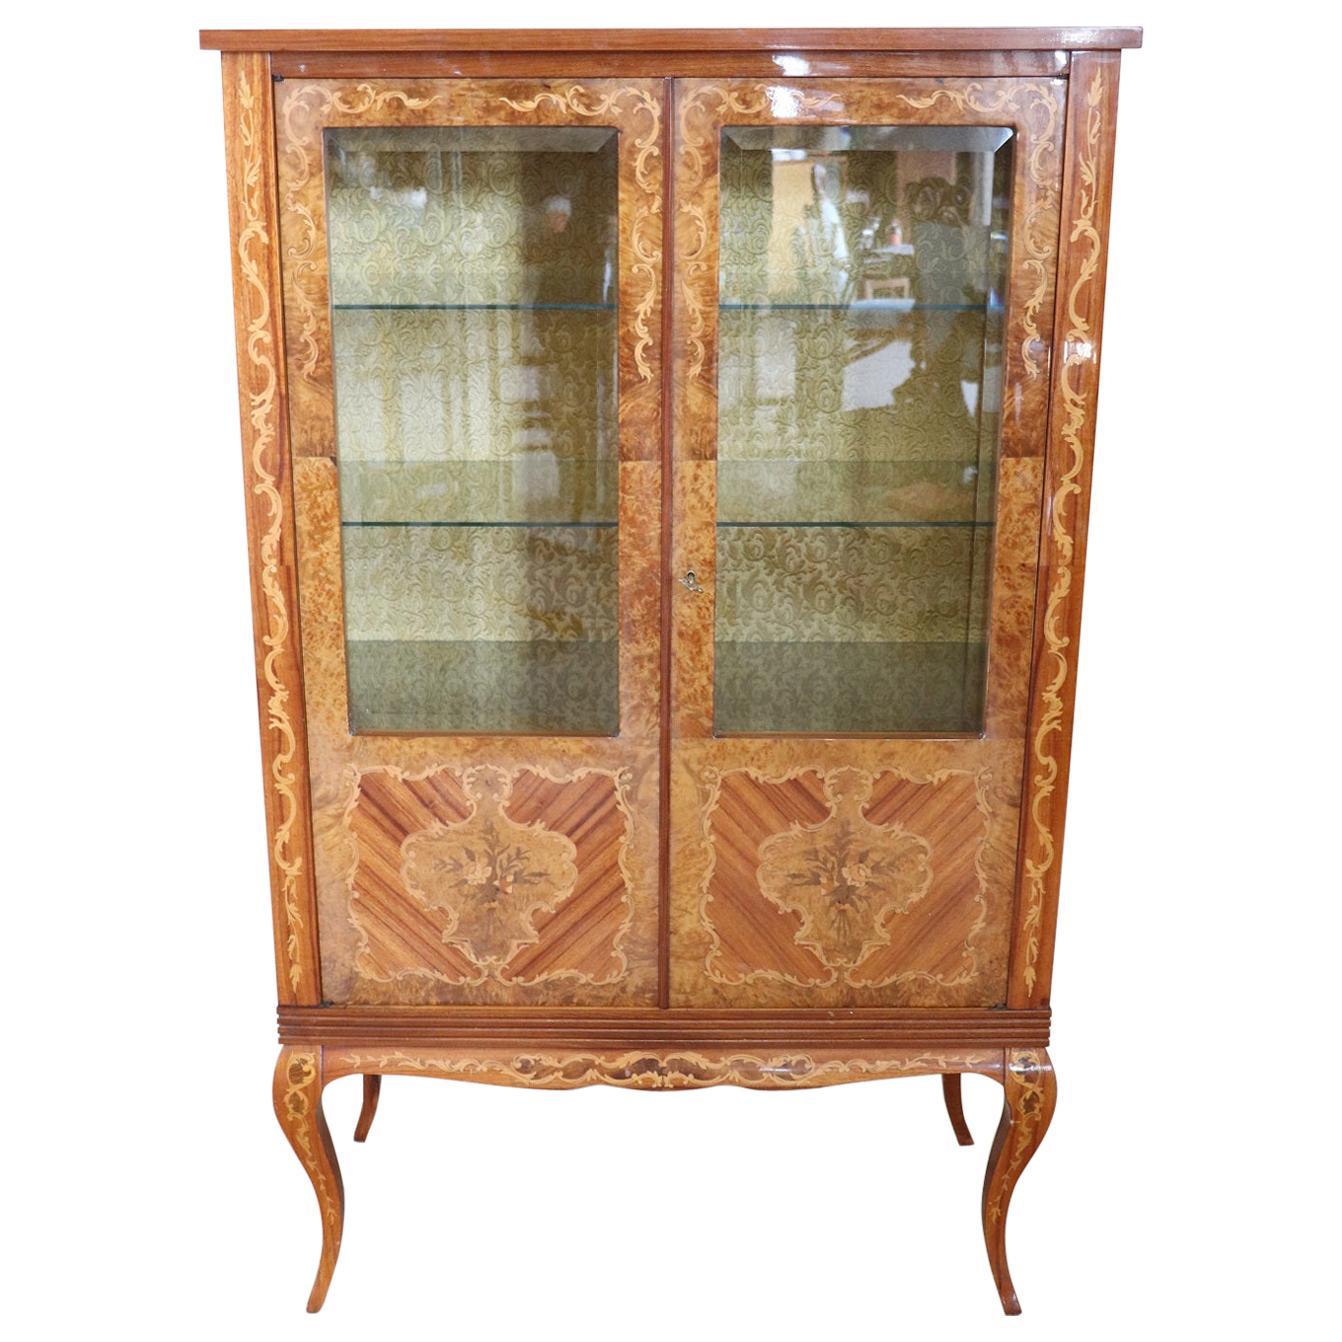 20th Century Louis XV Style Inlaid Wood Vitrine